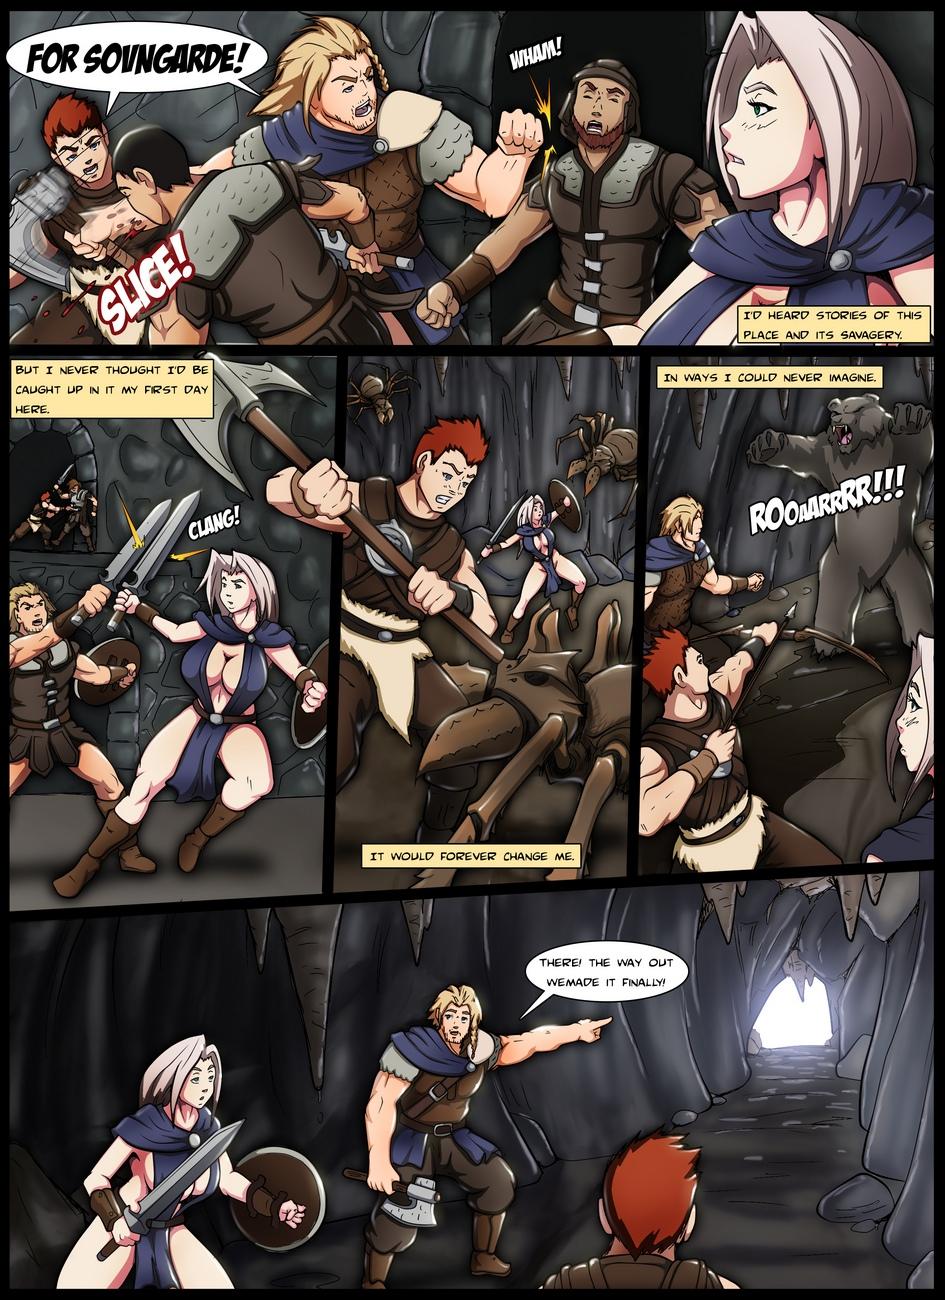 Legend-Of-Skyrift-1 5 free sex comic